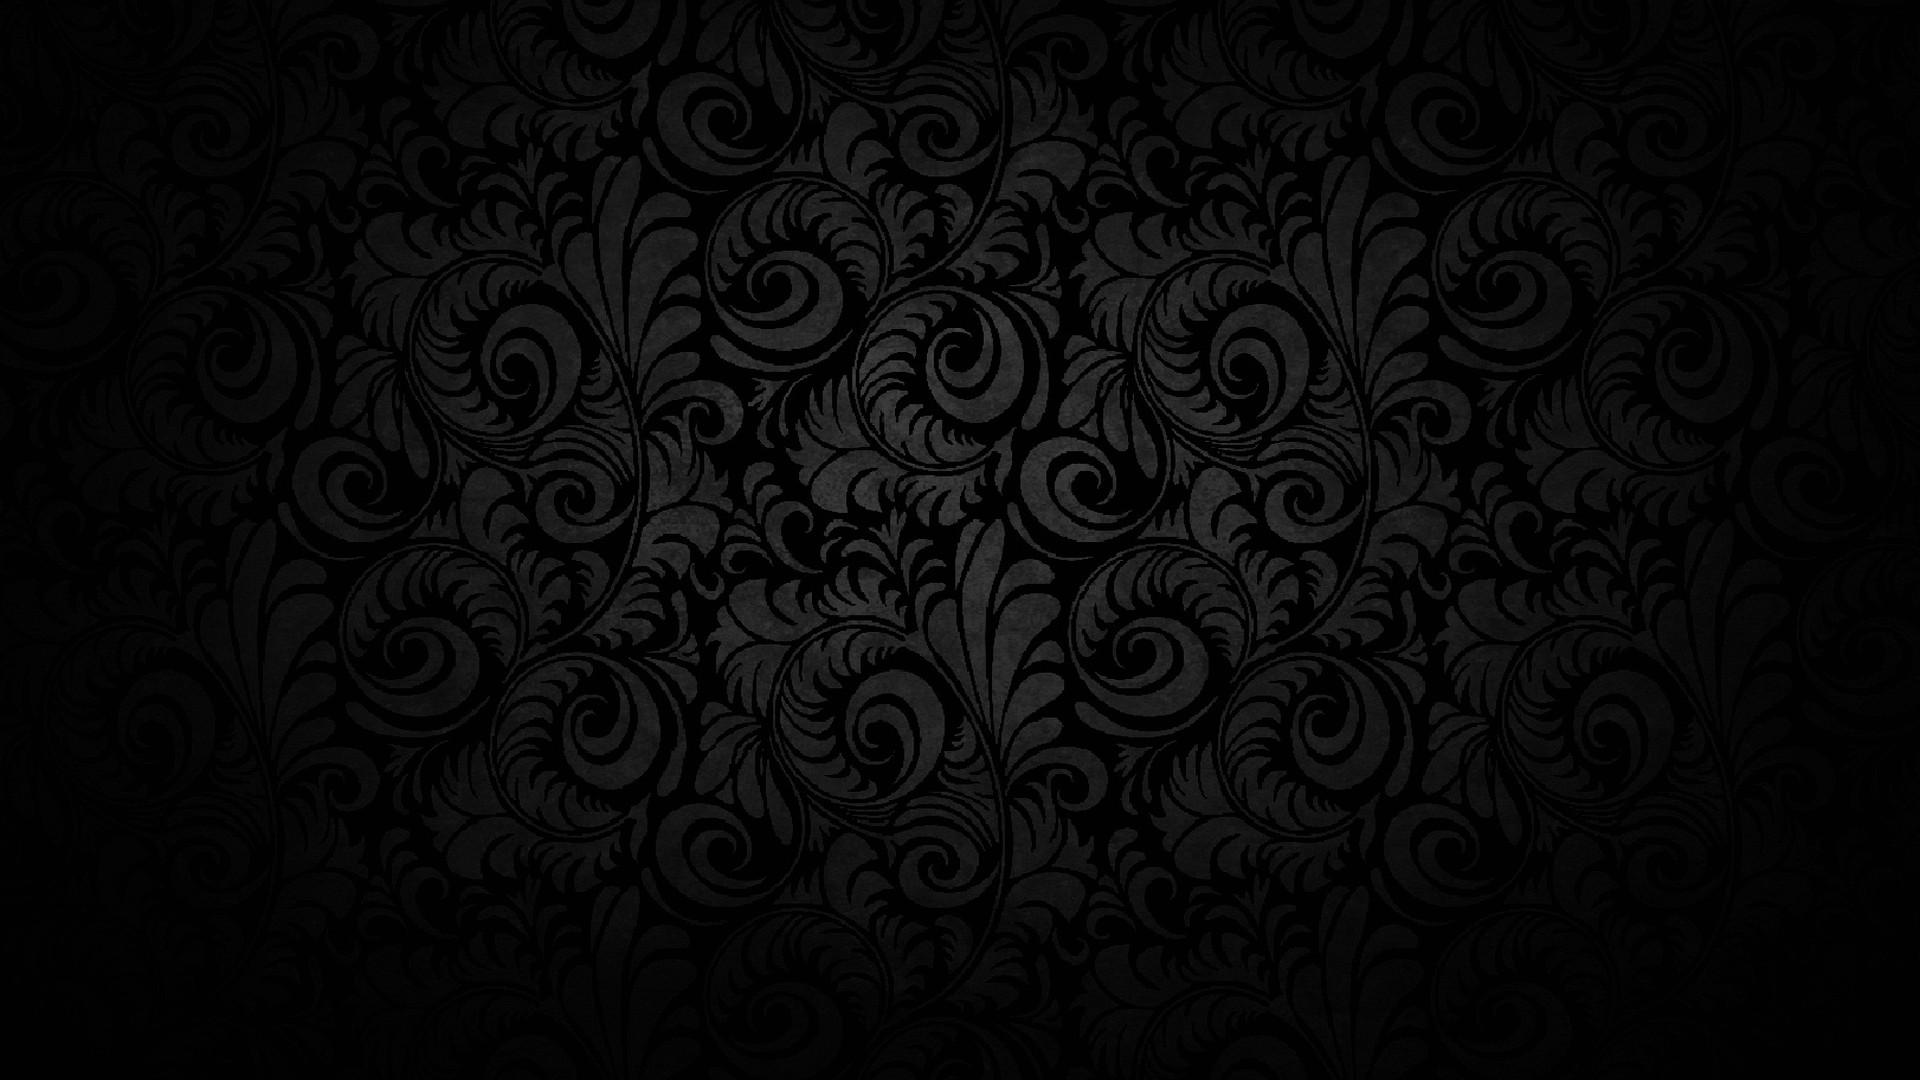 1920x1080 Fall Hd Wallpaper Sfondi Scuri Hd 85 Immagini